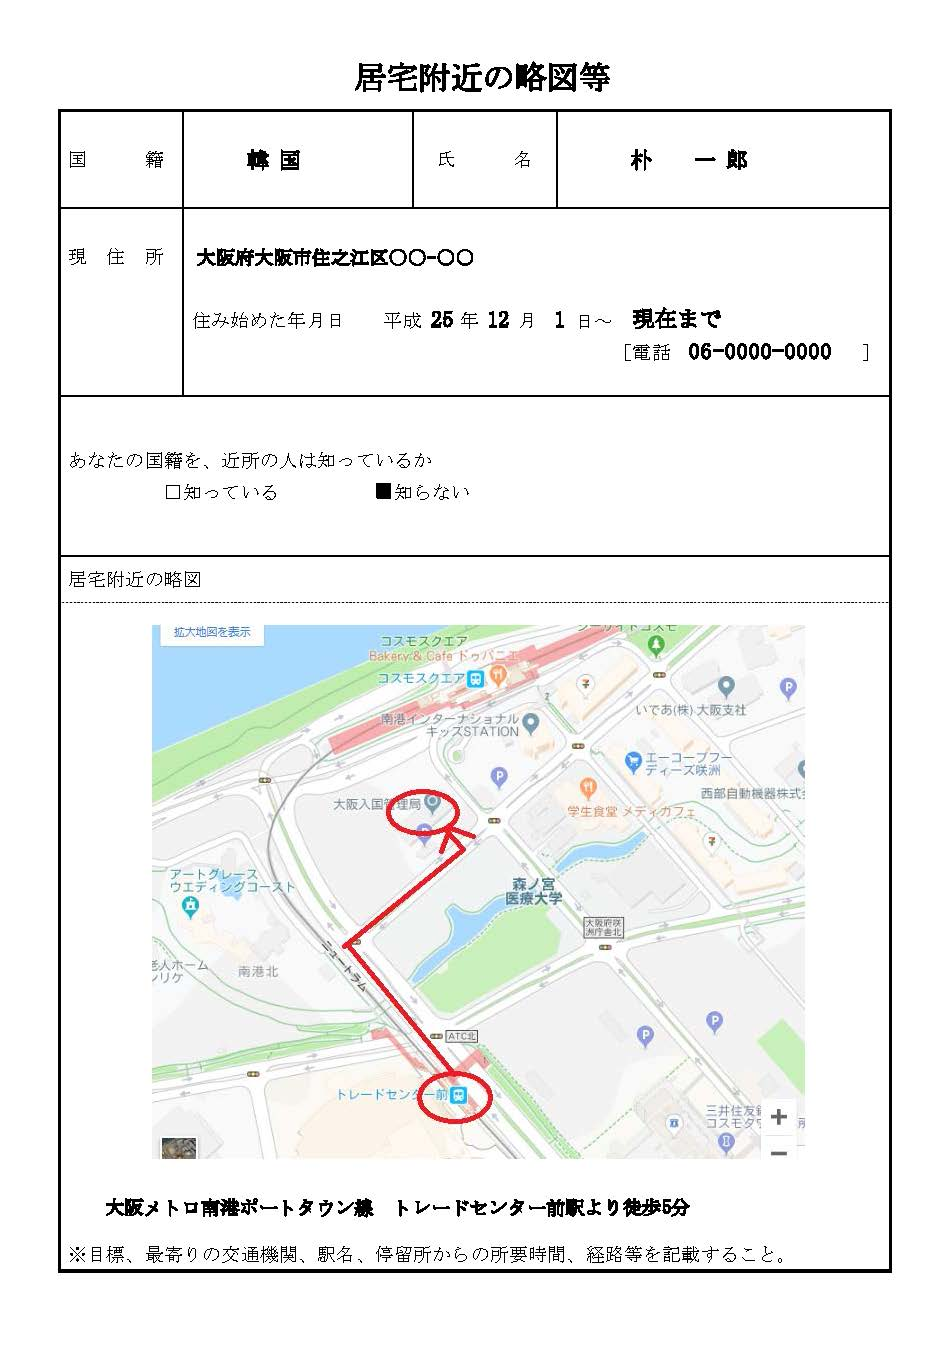 居宅付近の略図